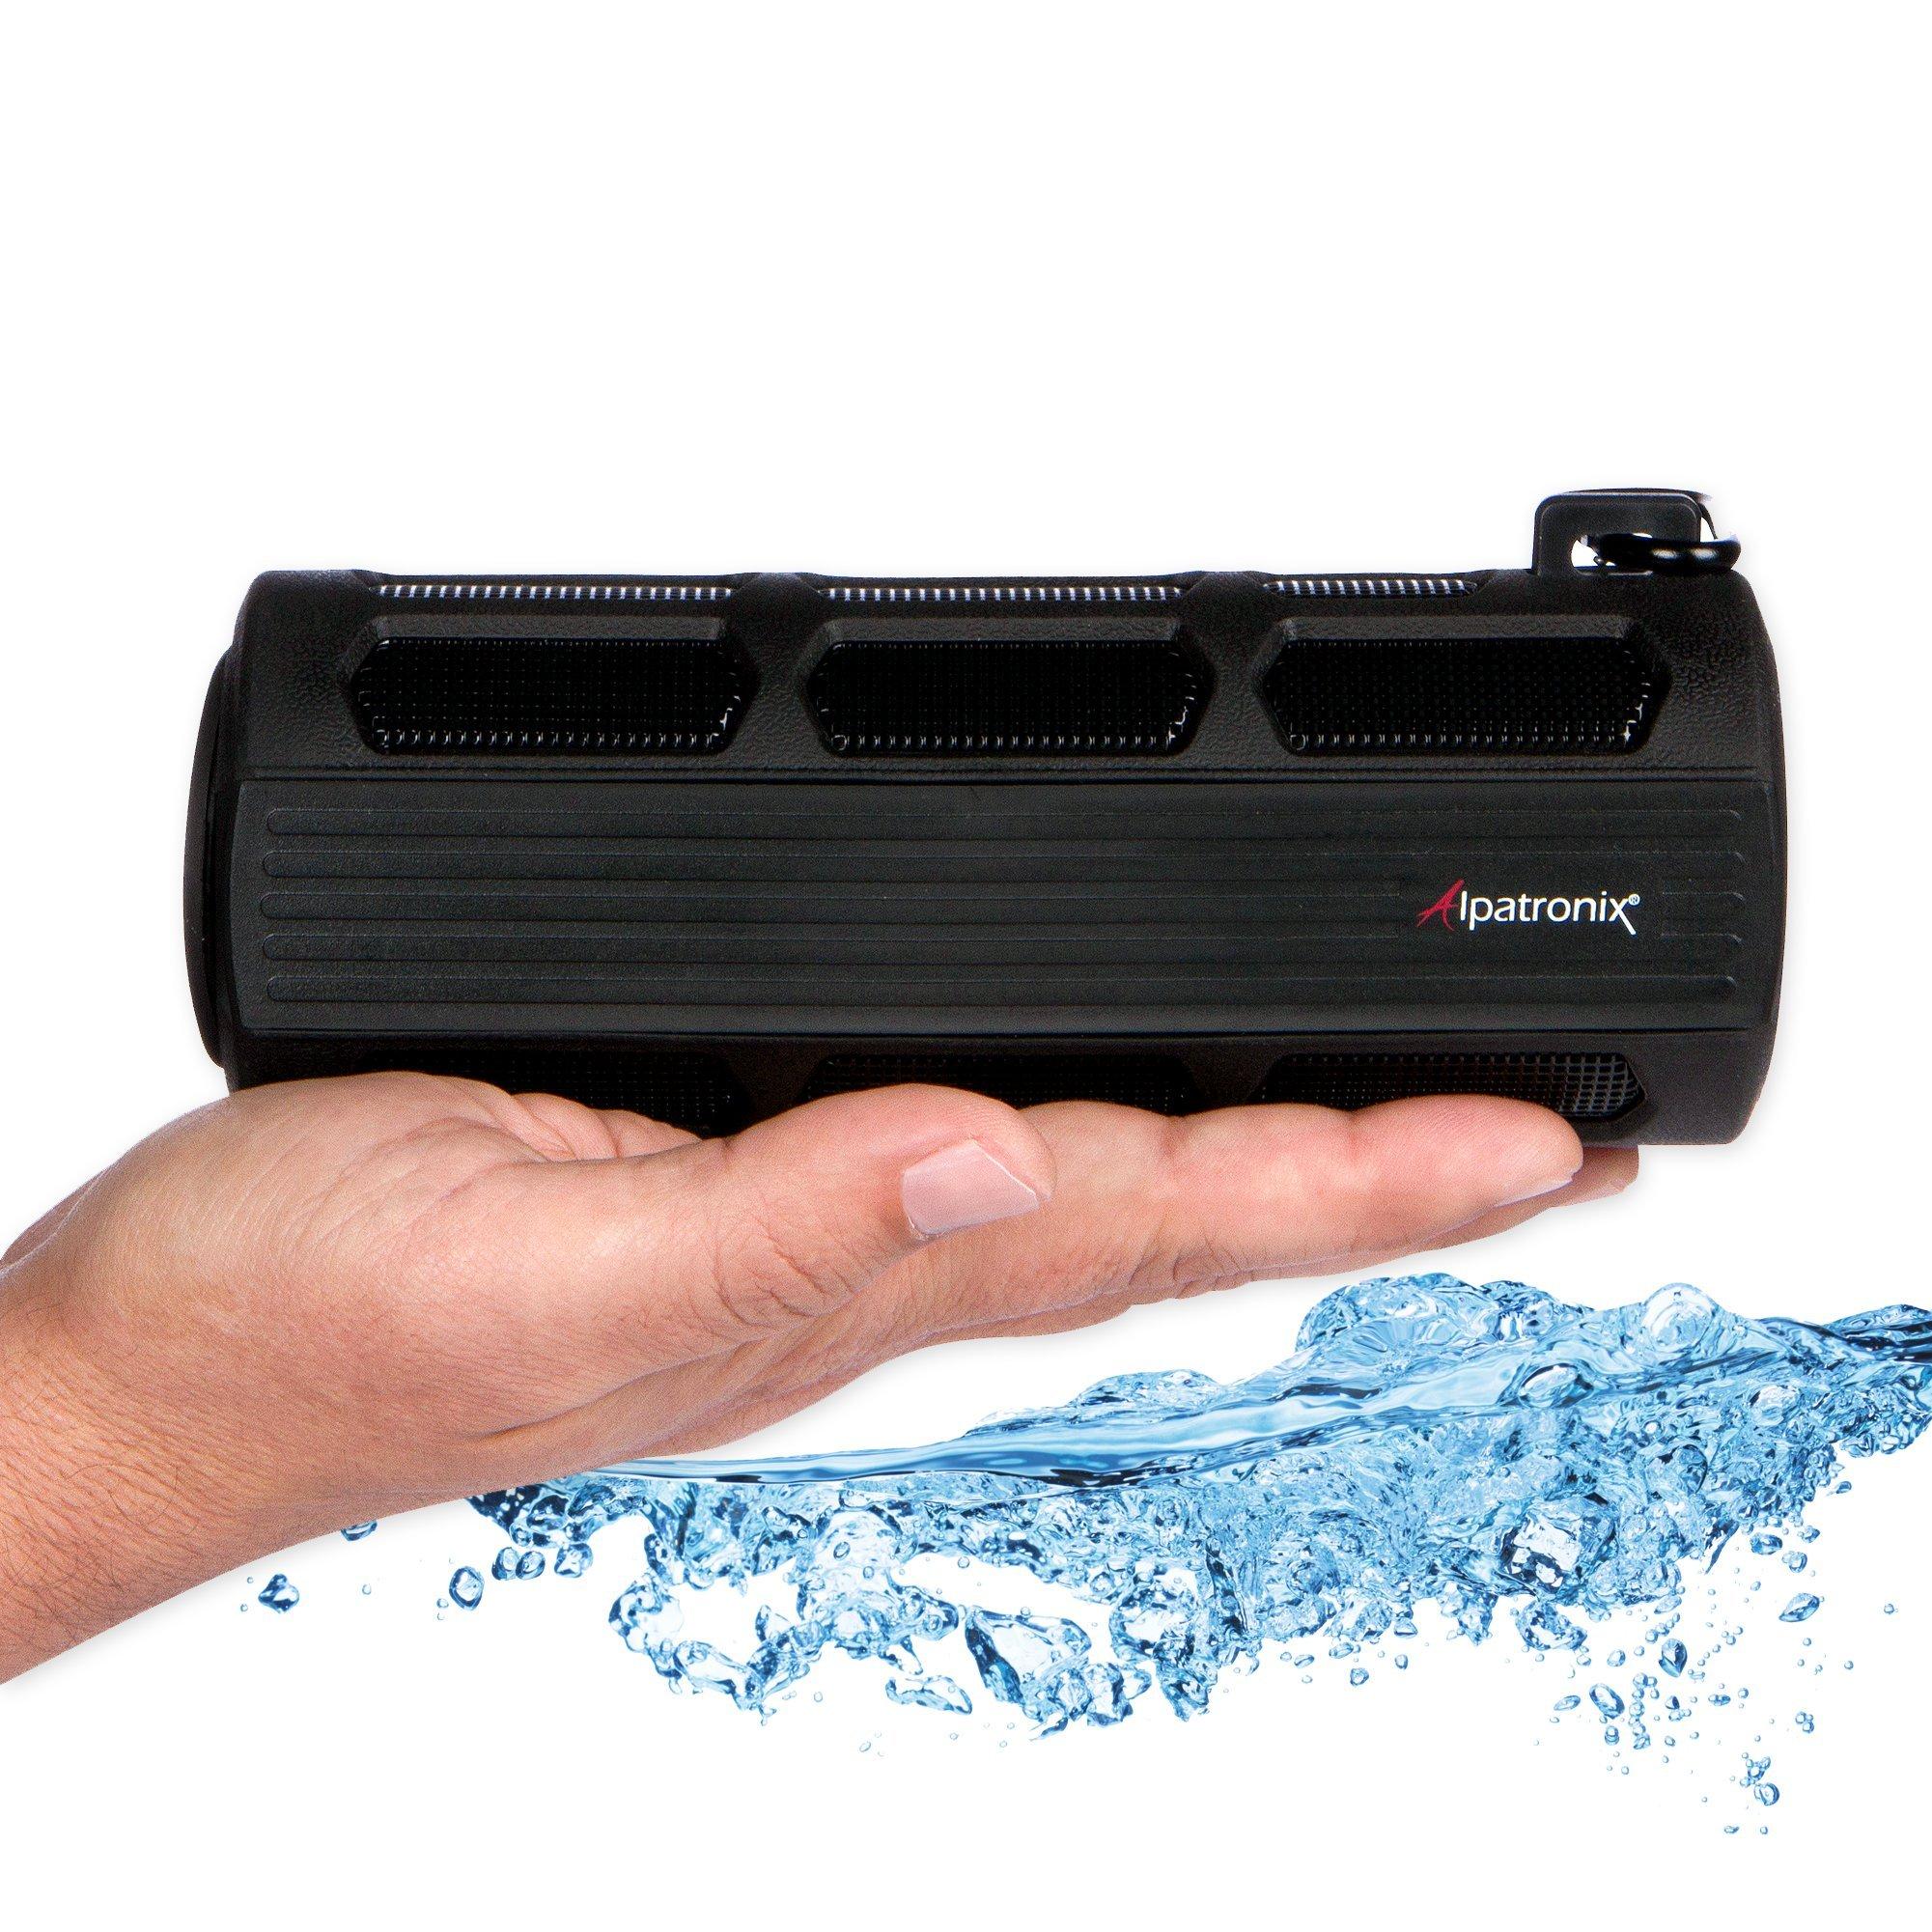 Alpatronix Waterproof Bluetooth Speaker Portable Rechargeable 12W Stereo Shockproof & Dustproof Wireless Speaker w/Built-in Mic, Controls & Subwoofer for Bicycles, Smartphones & Computers - Black